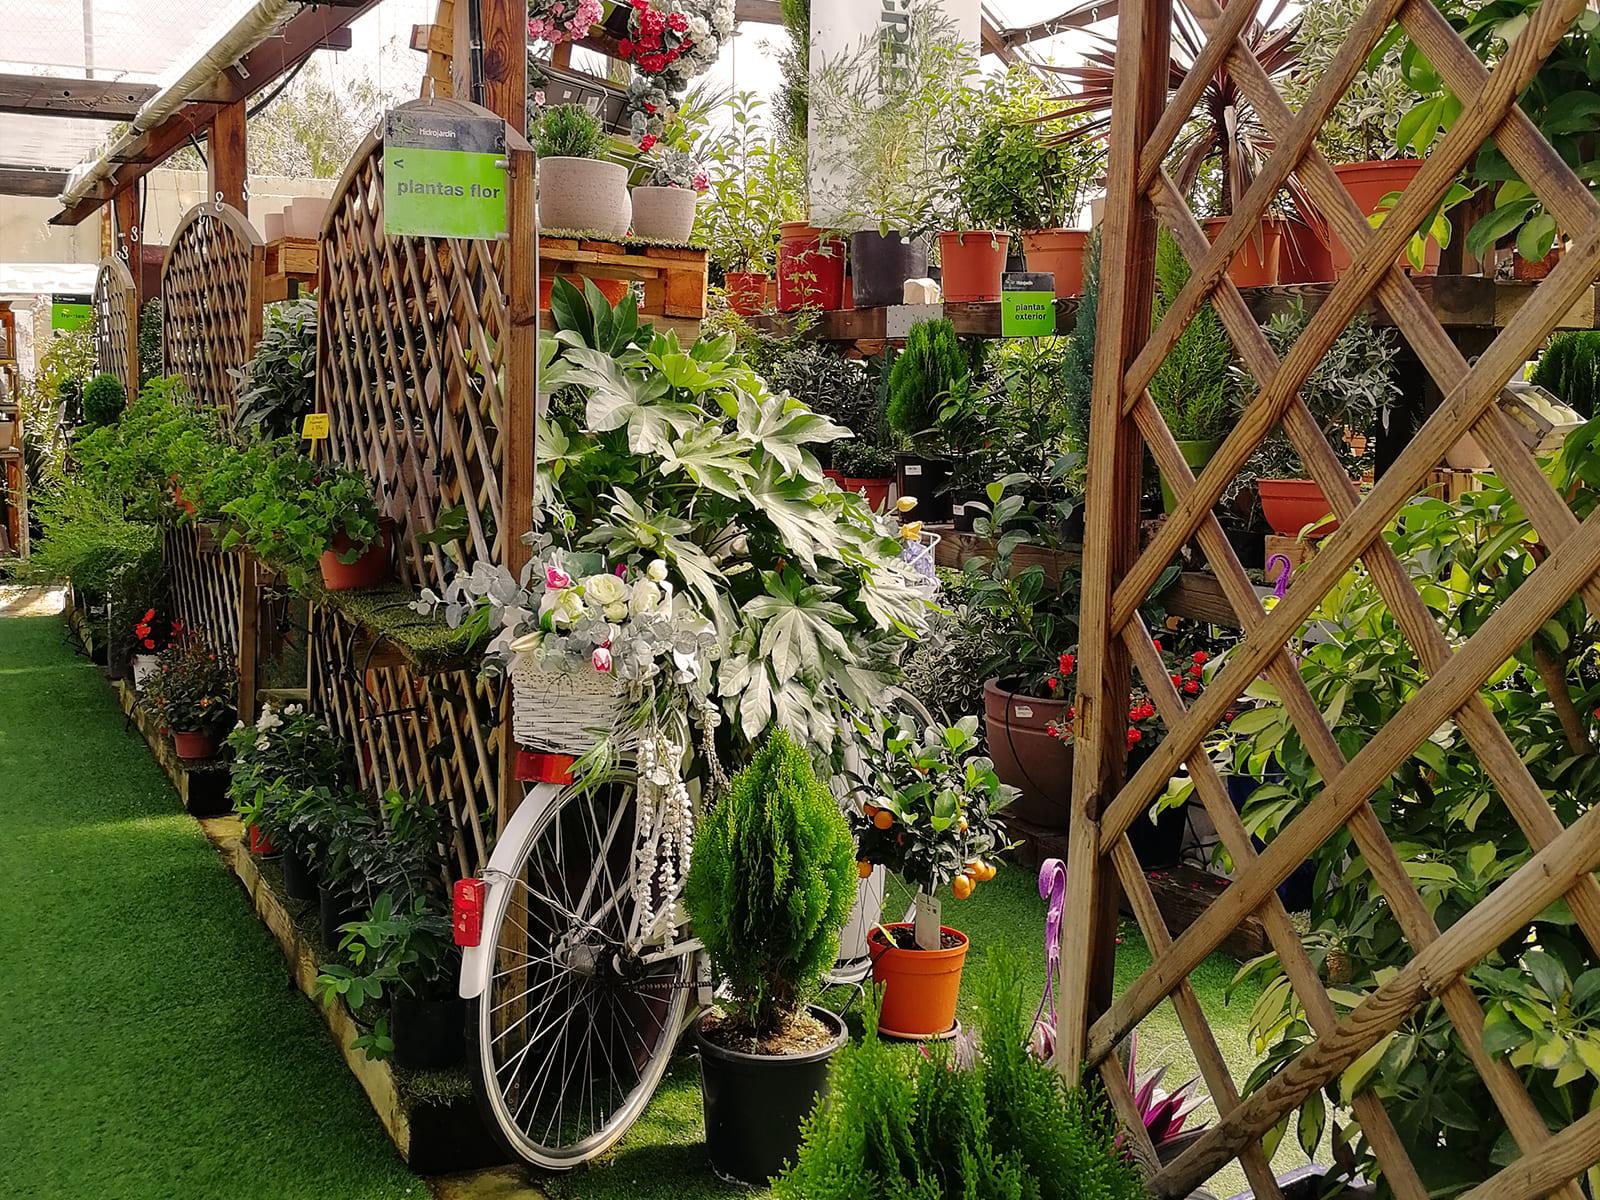 centro-jardineria-garden-invernadero-artesanal-madera-fuente-14_HIDROJARDIN-Bañeres